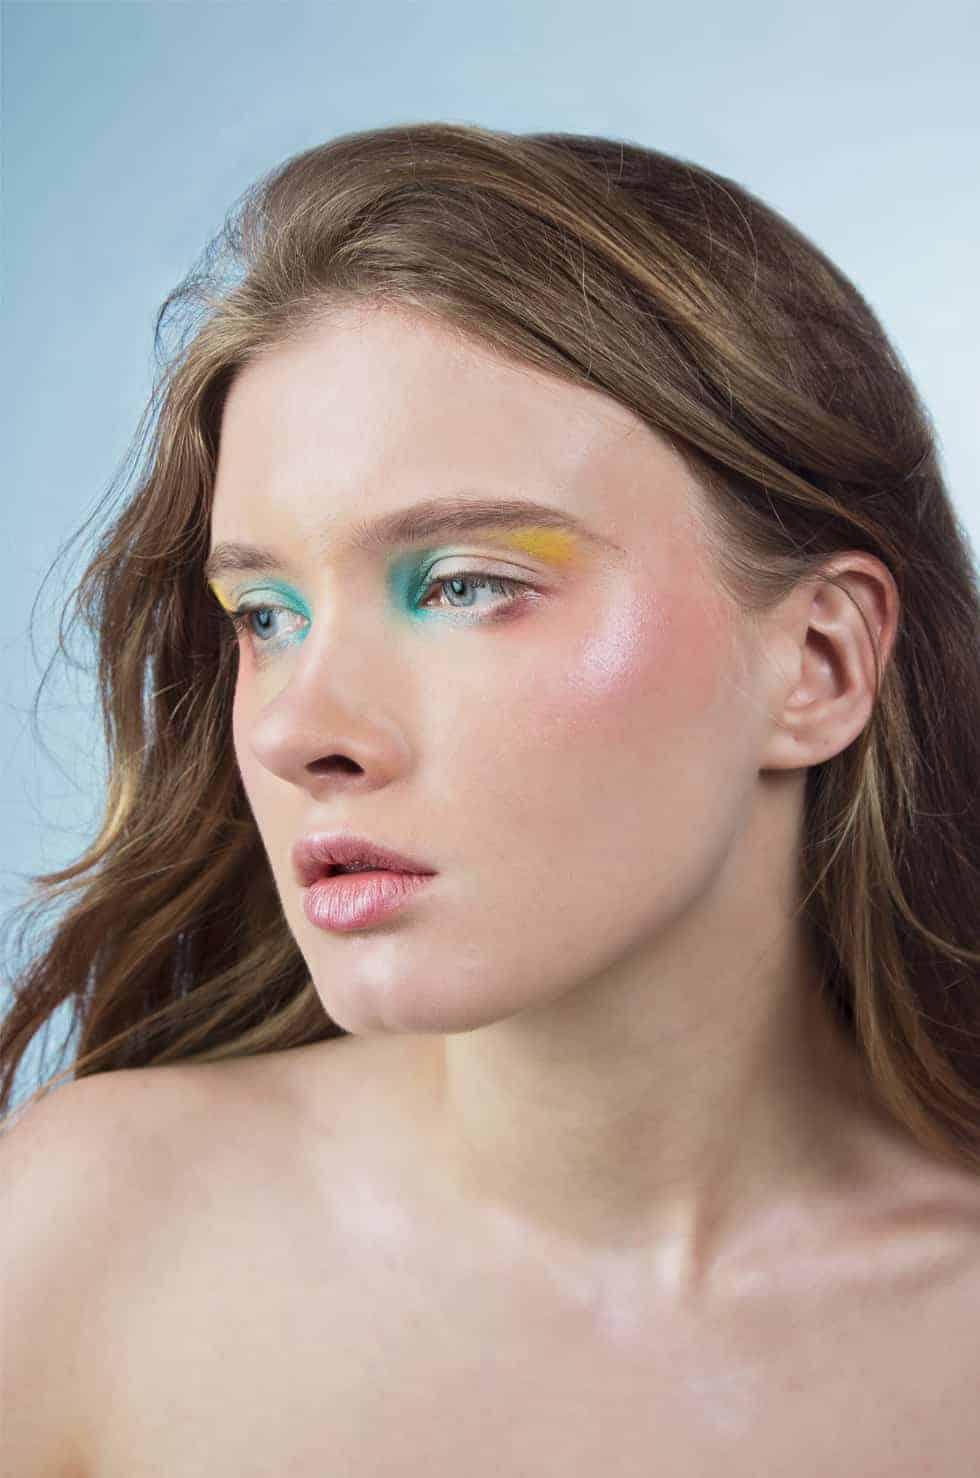 Beauty - Editorial